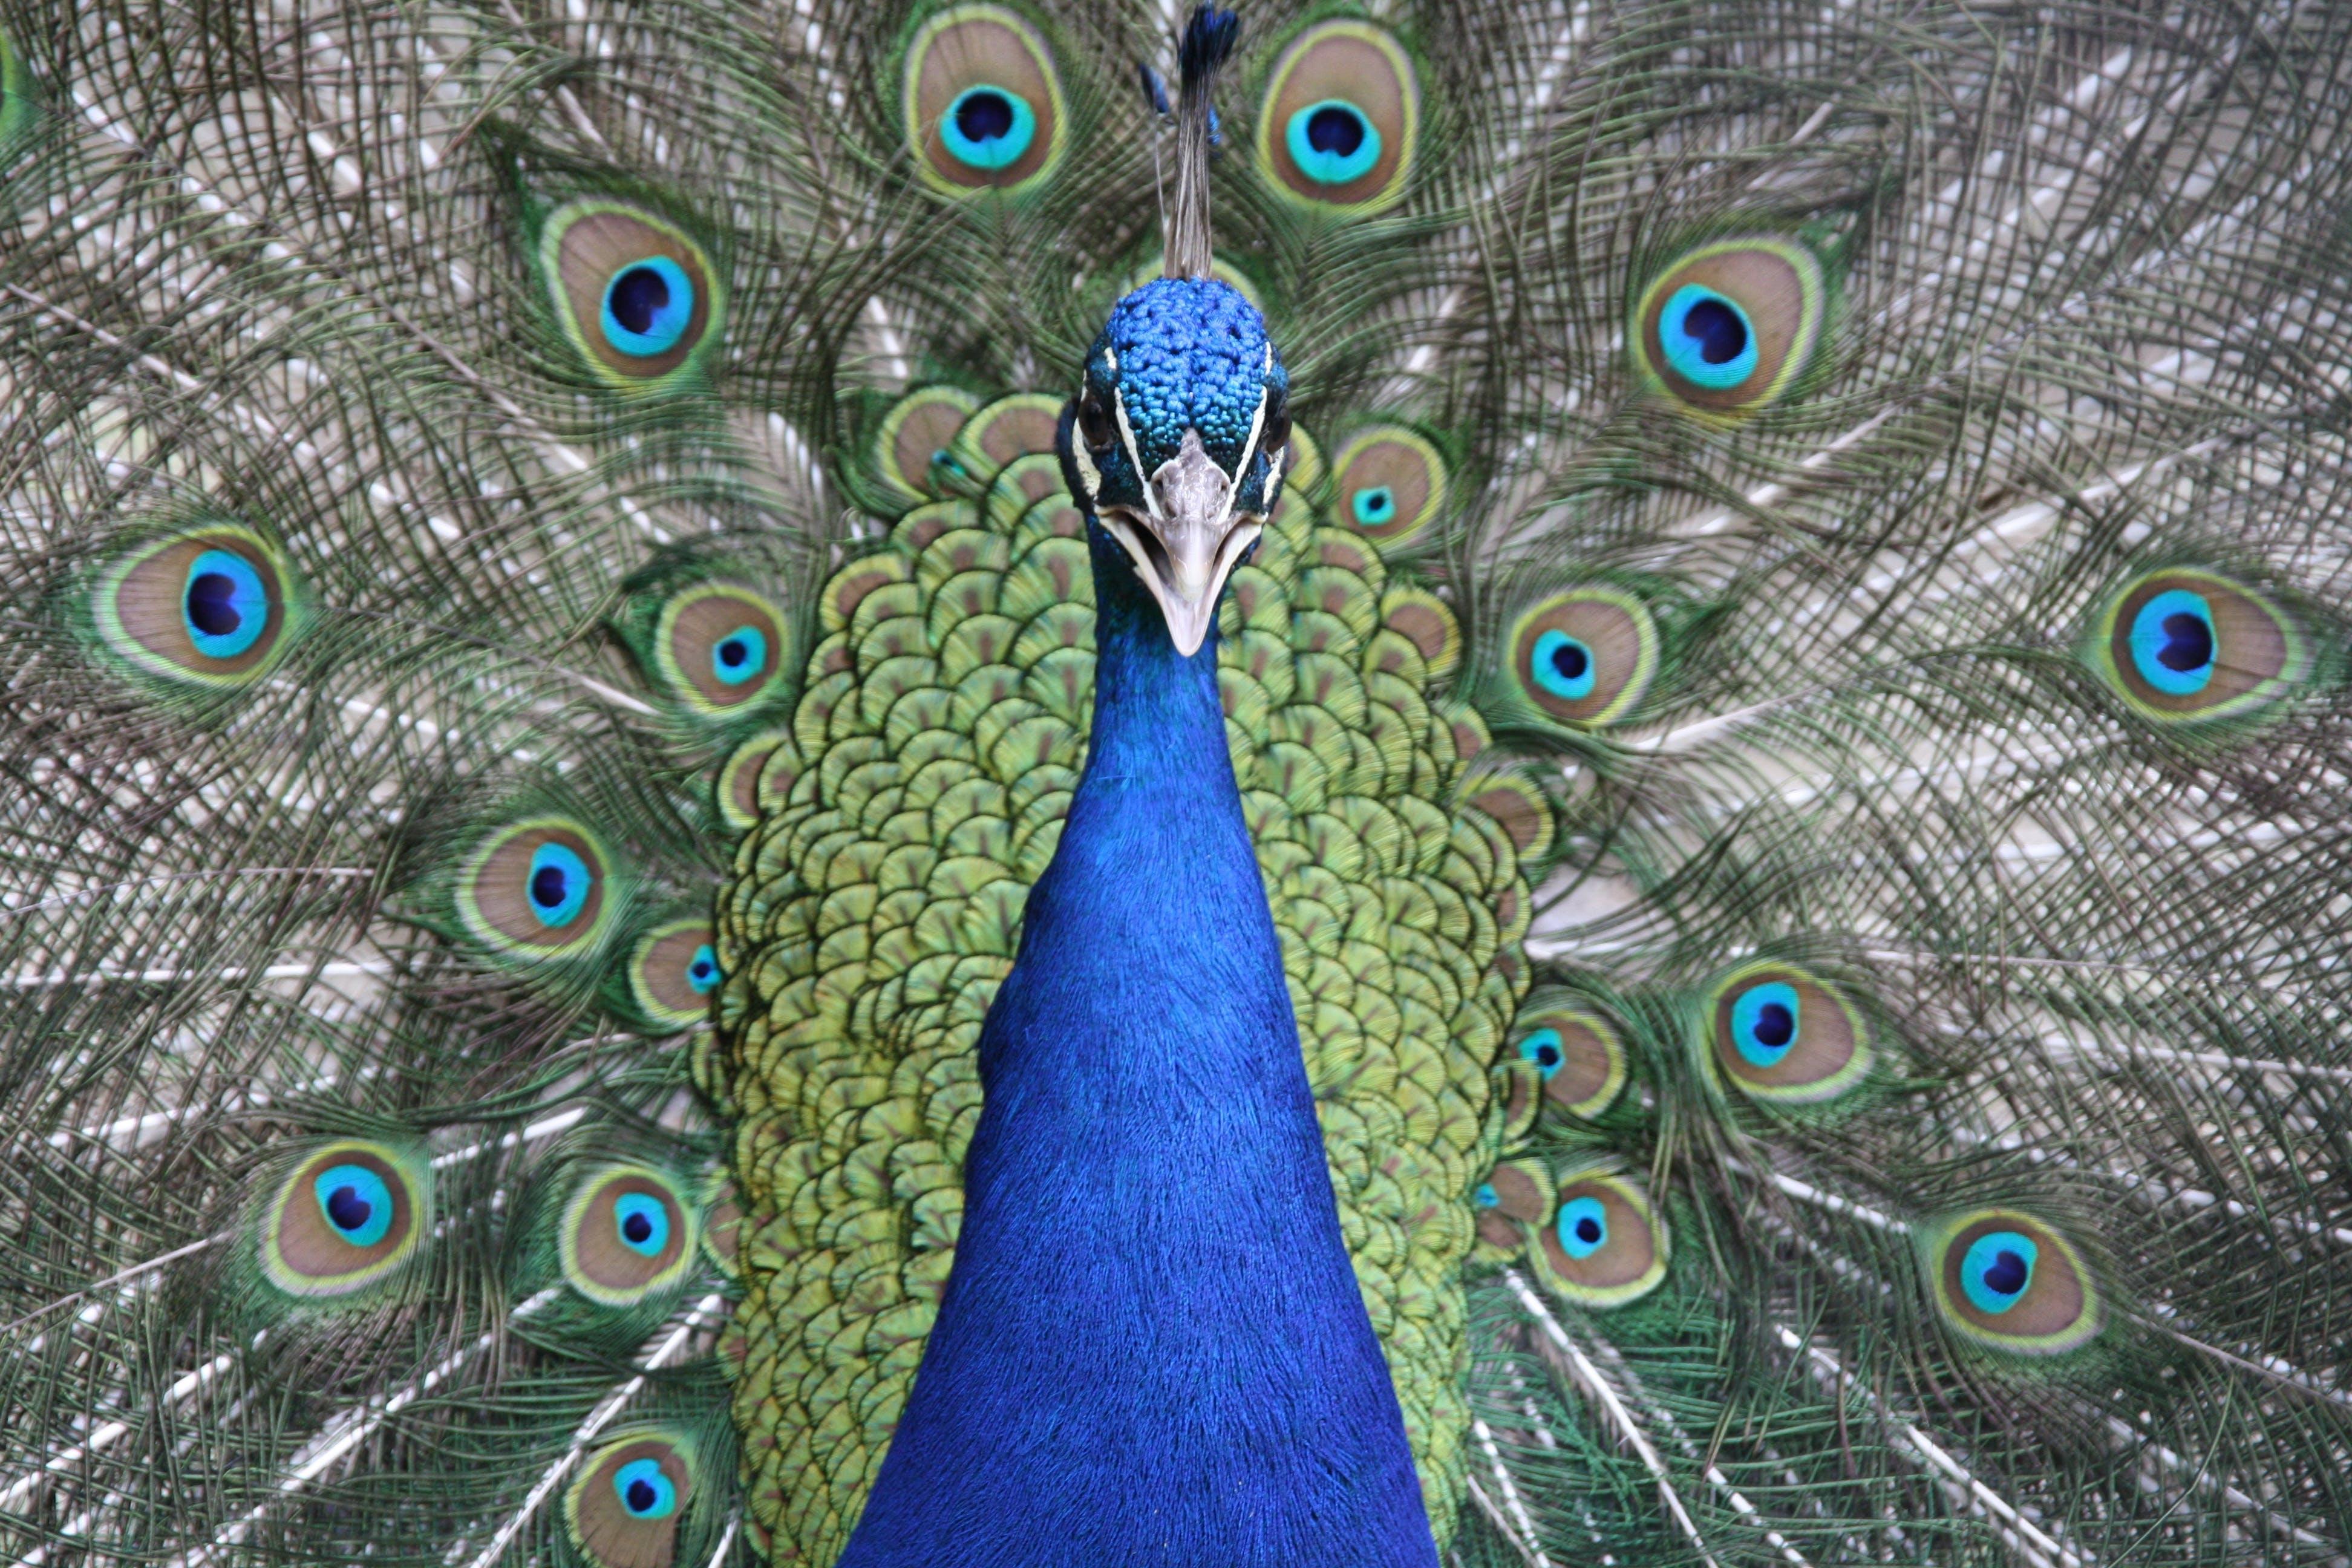 animal, animal photography, beautiful